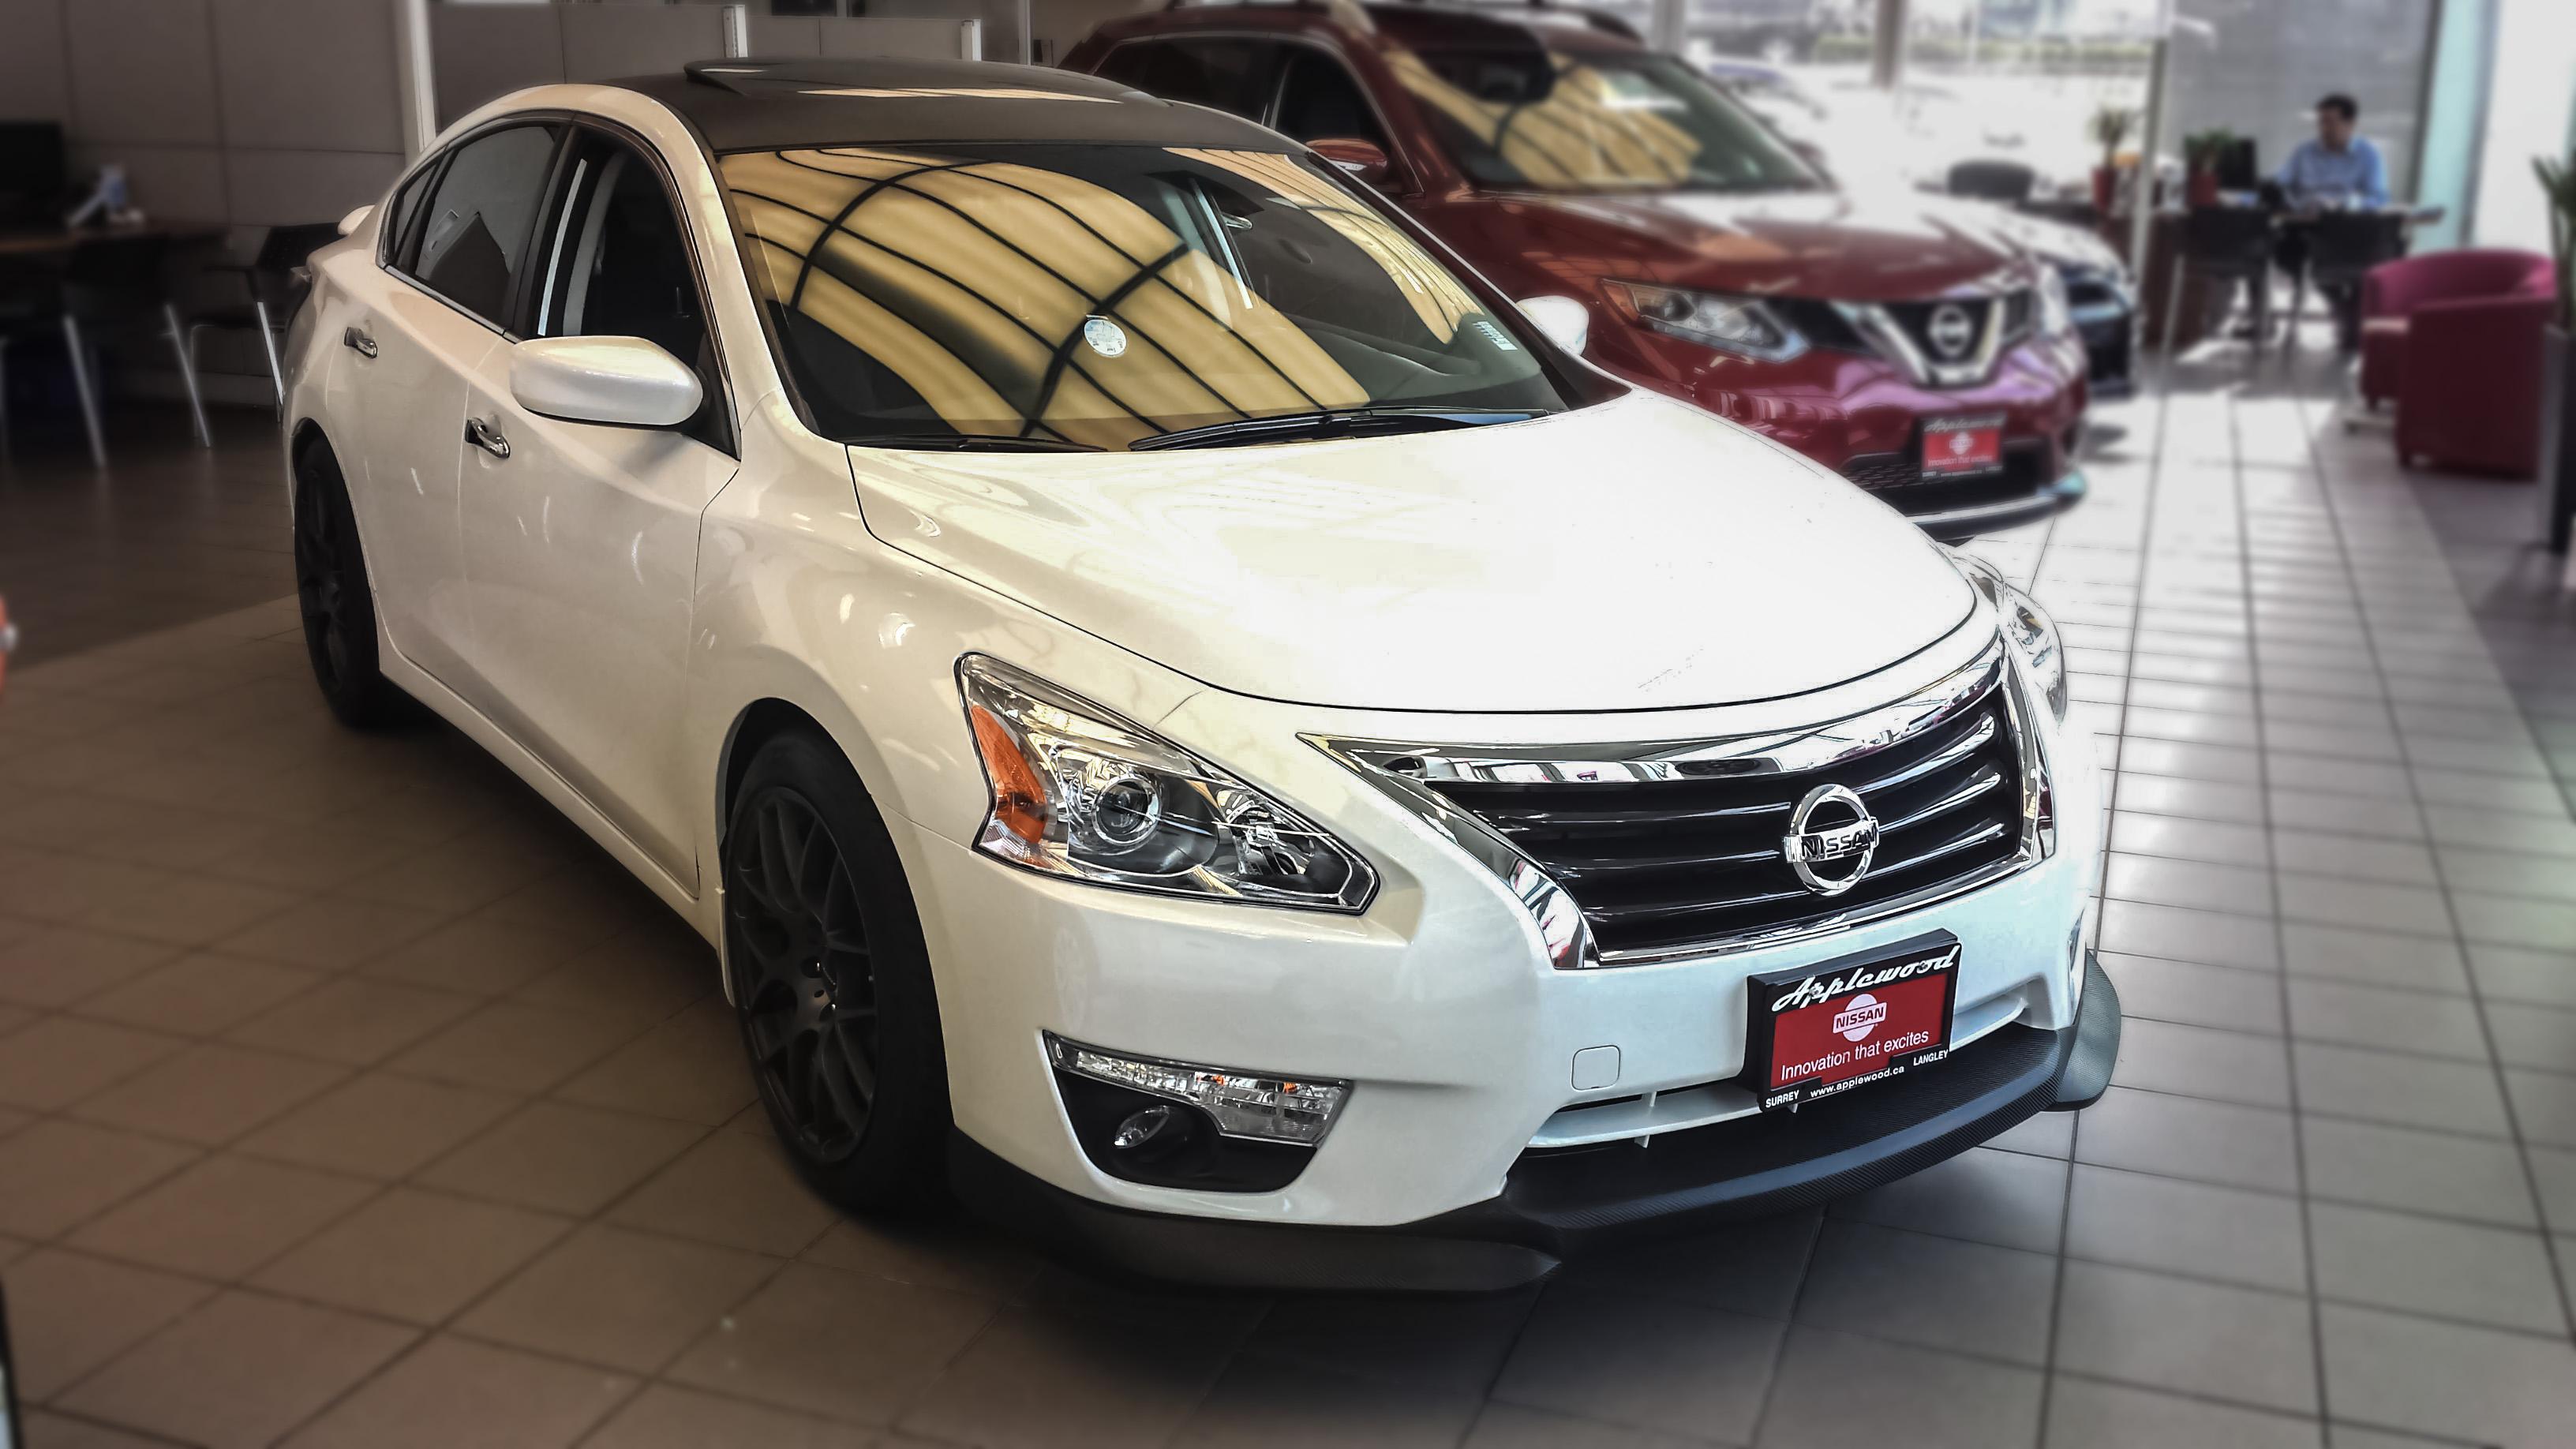 altima for used sedan s sale fwd nissan